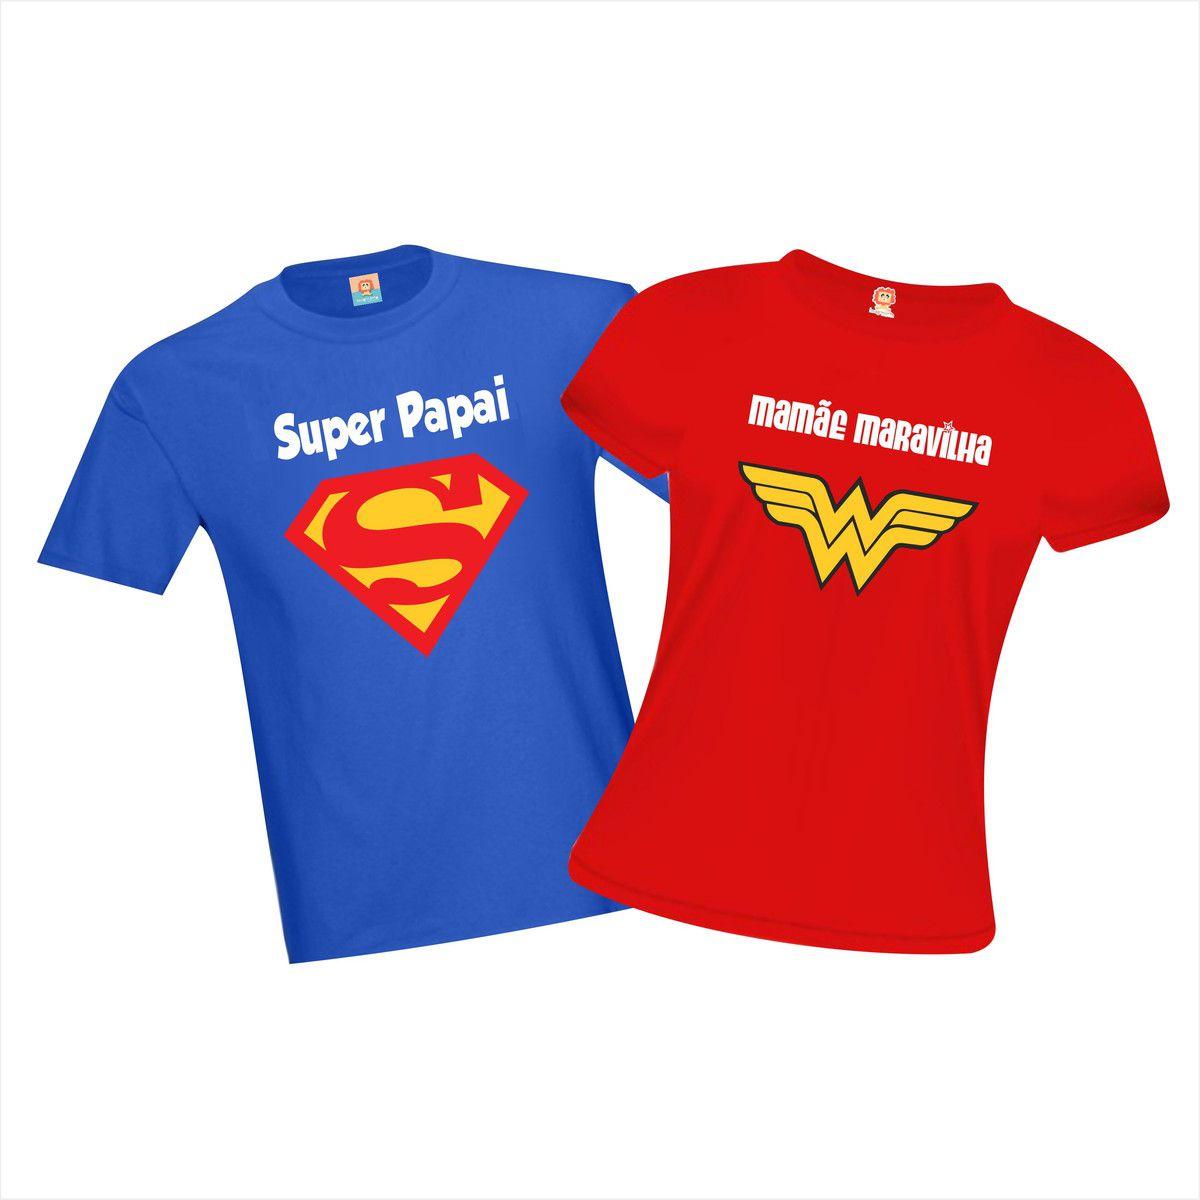 Camiseta Super Papai e Mamãe Maravilha